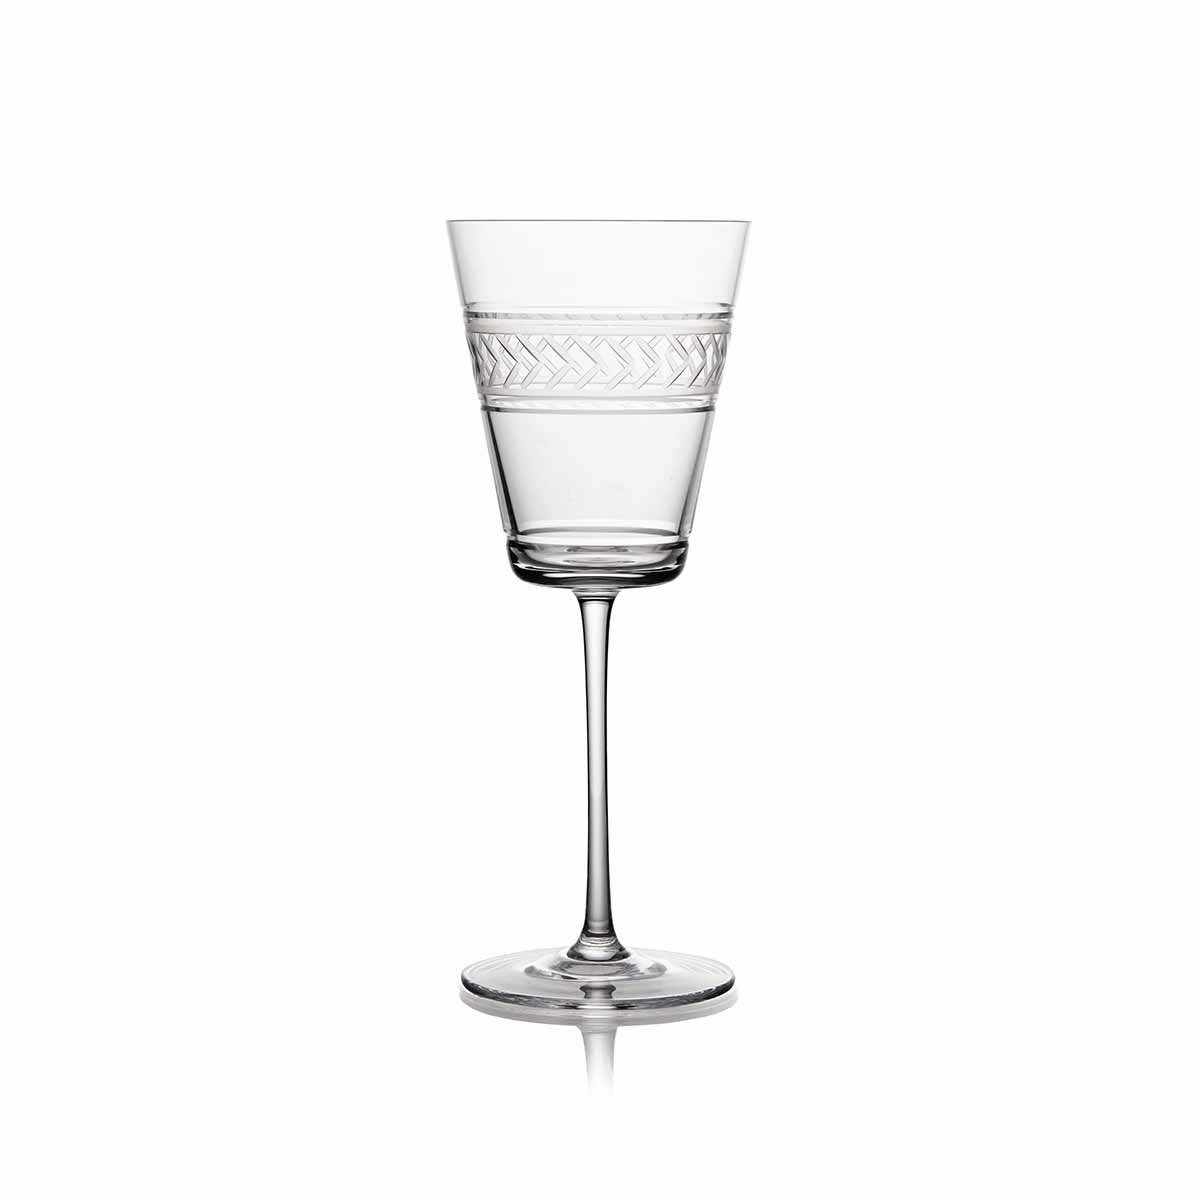 Michael Aram, Palace Crystal Wine Glass, Pair